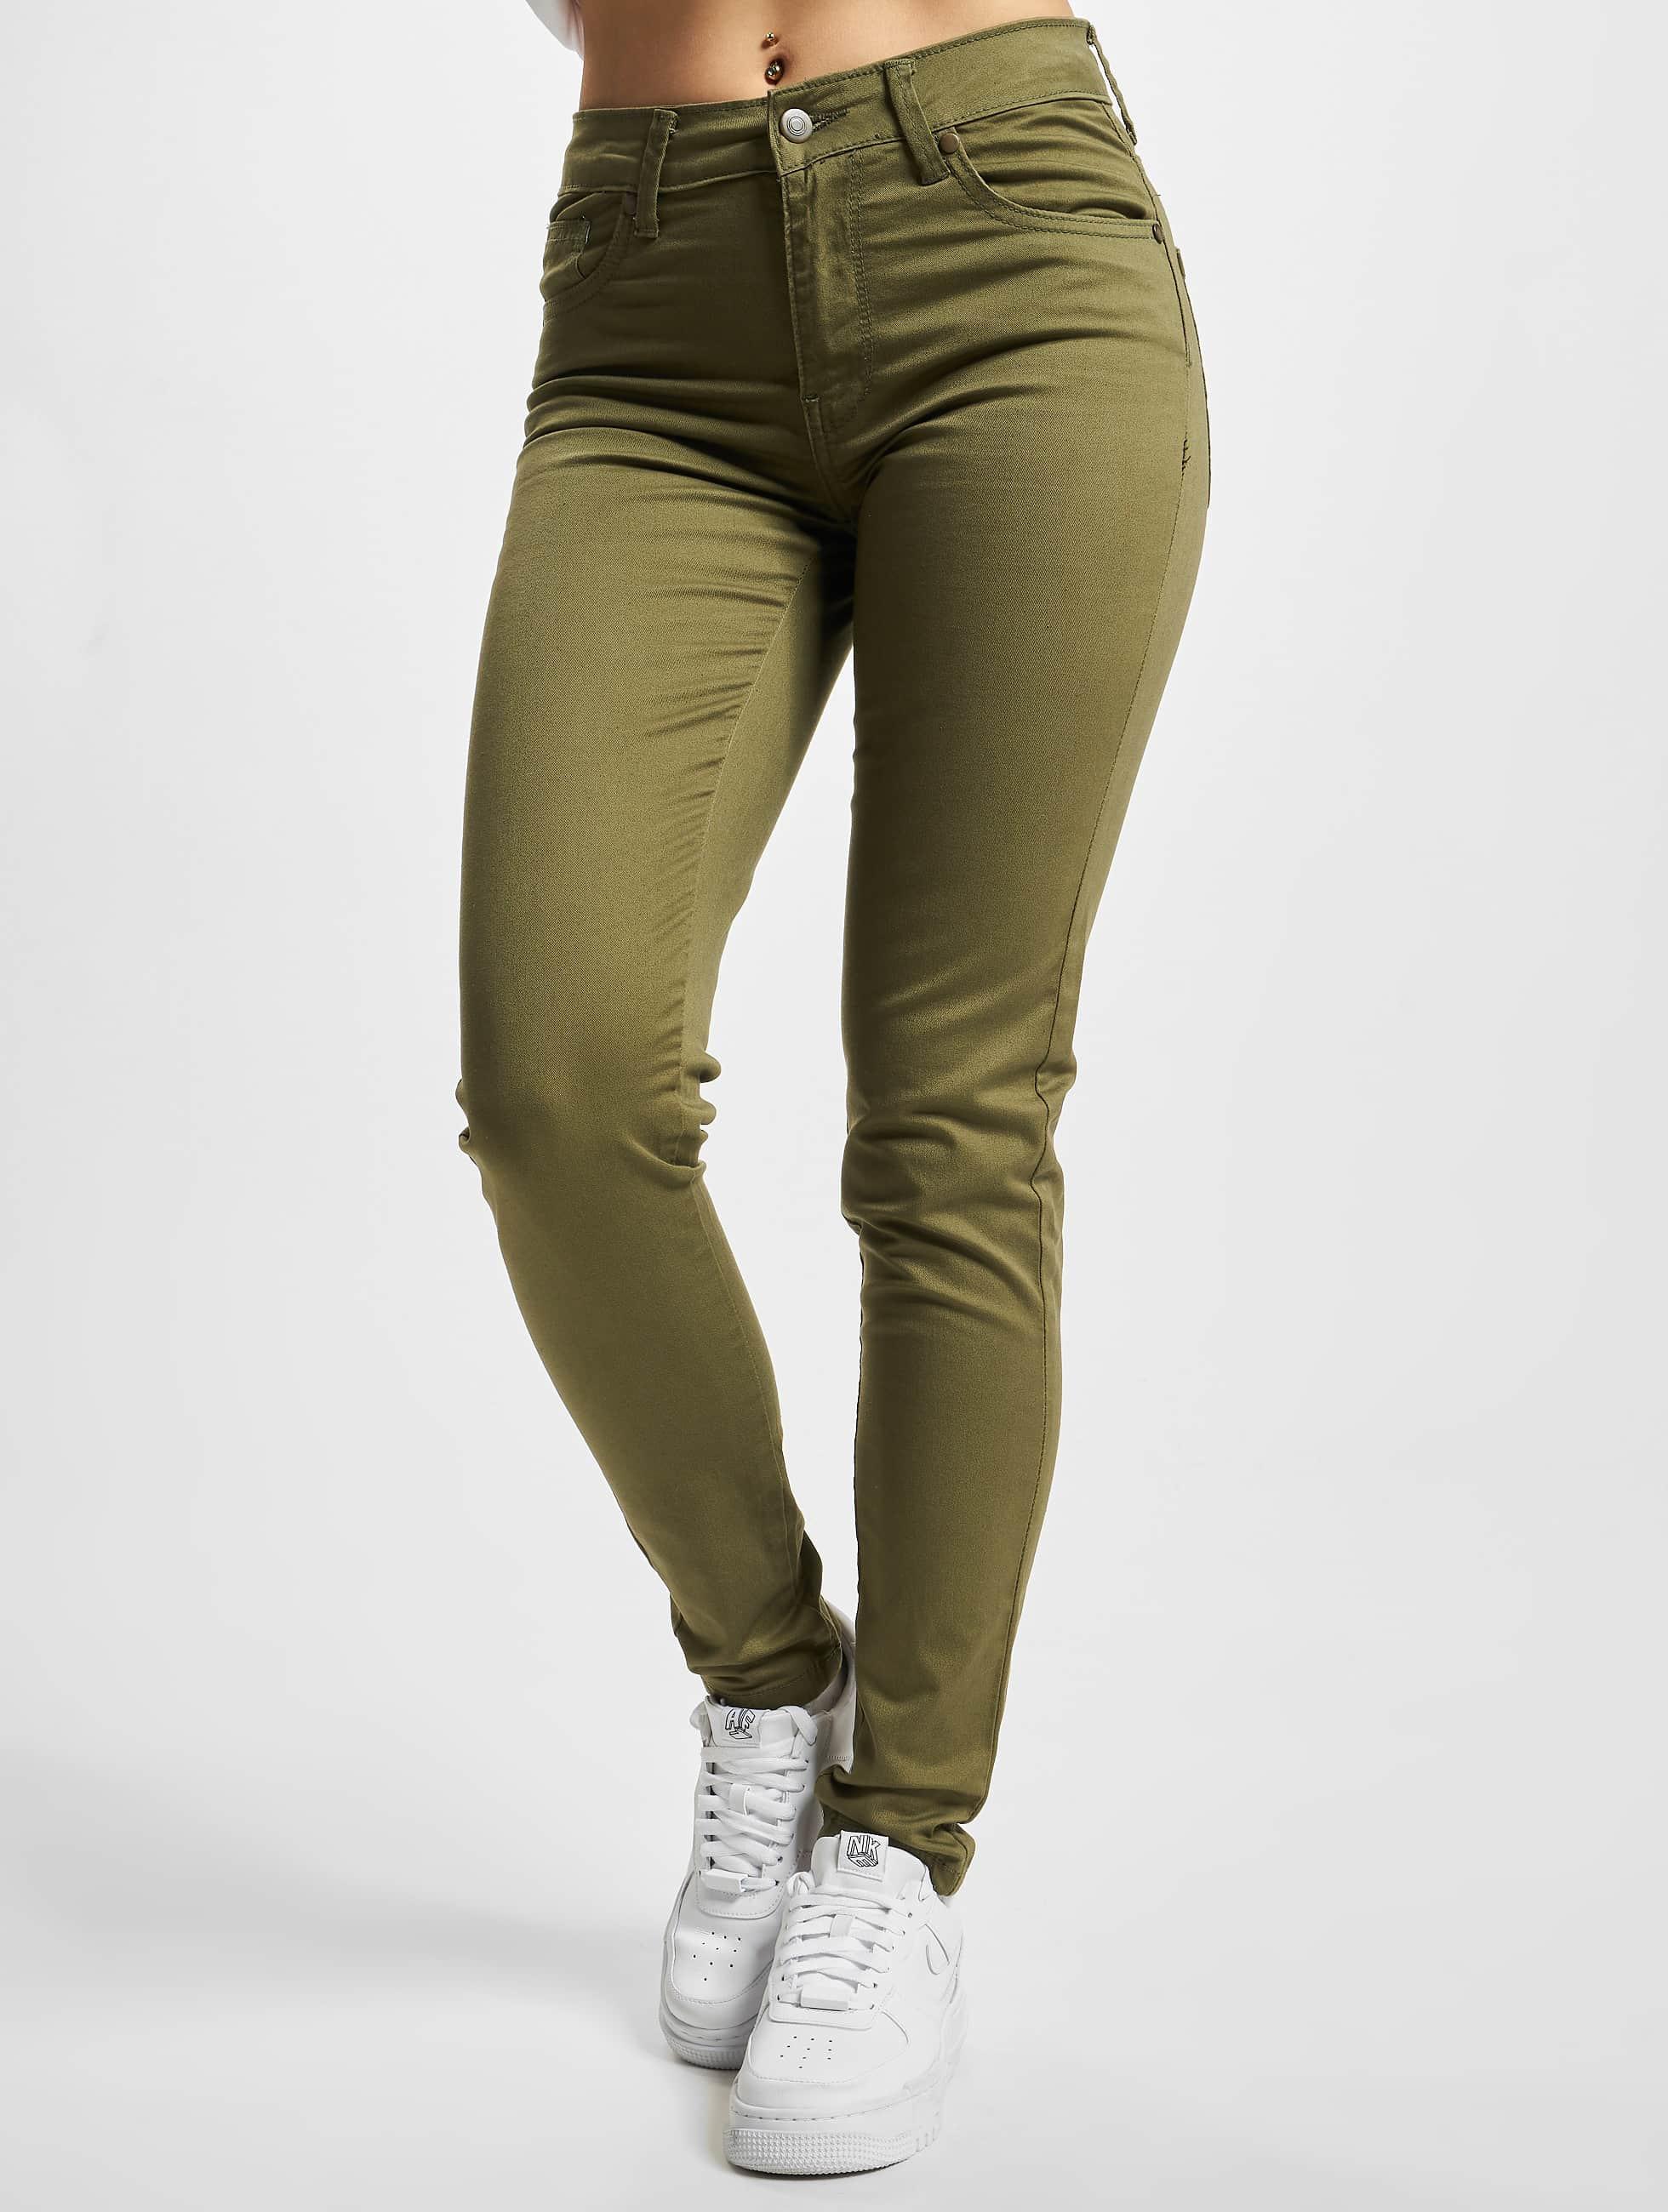 Urban Classics Skinny Jeans Ladies olive